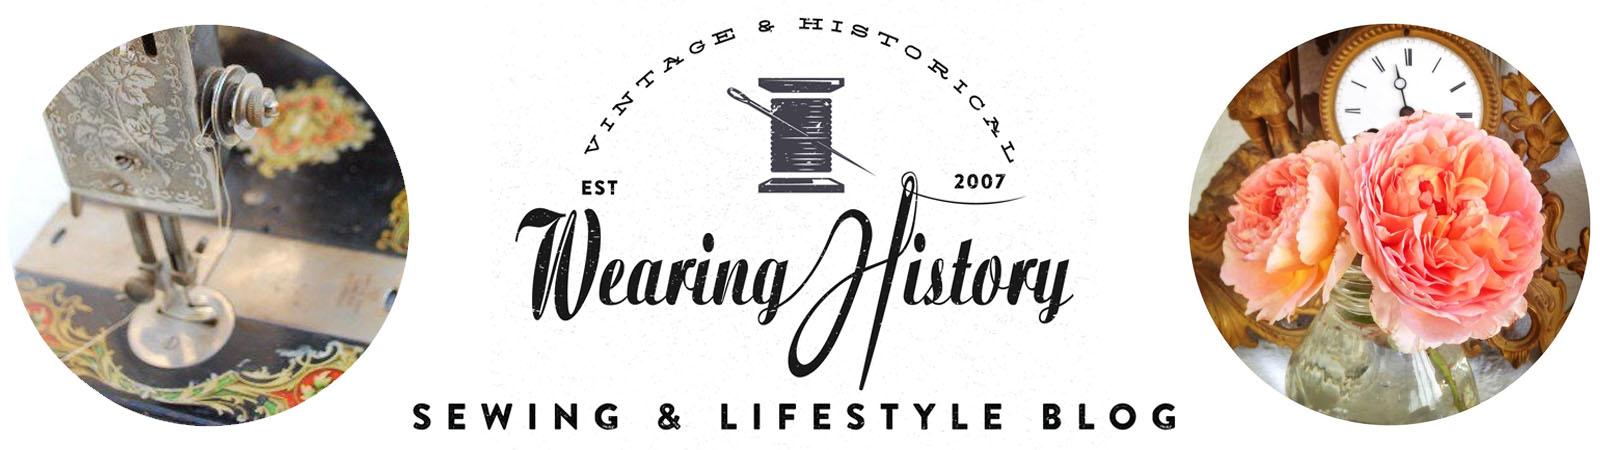 Wearing History® Blog